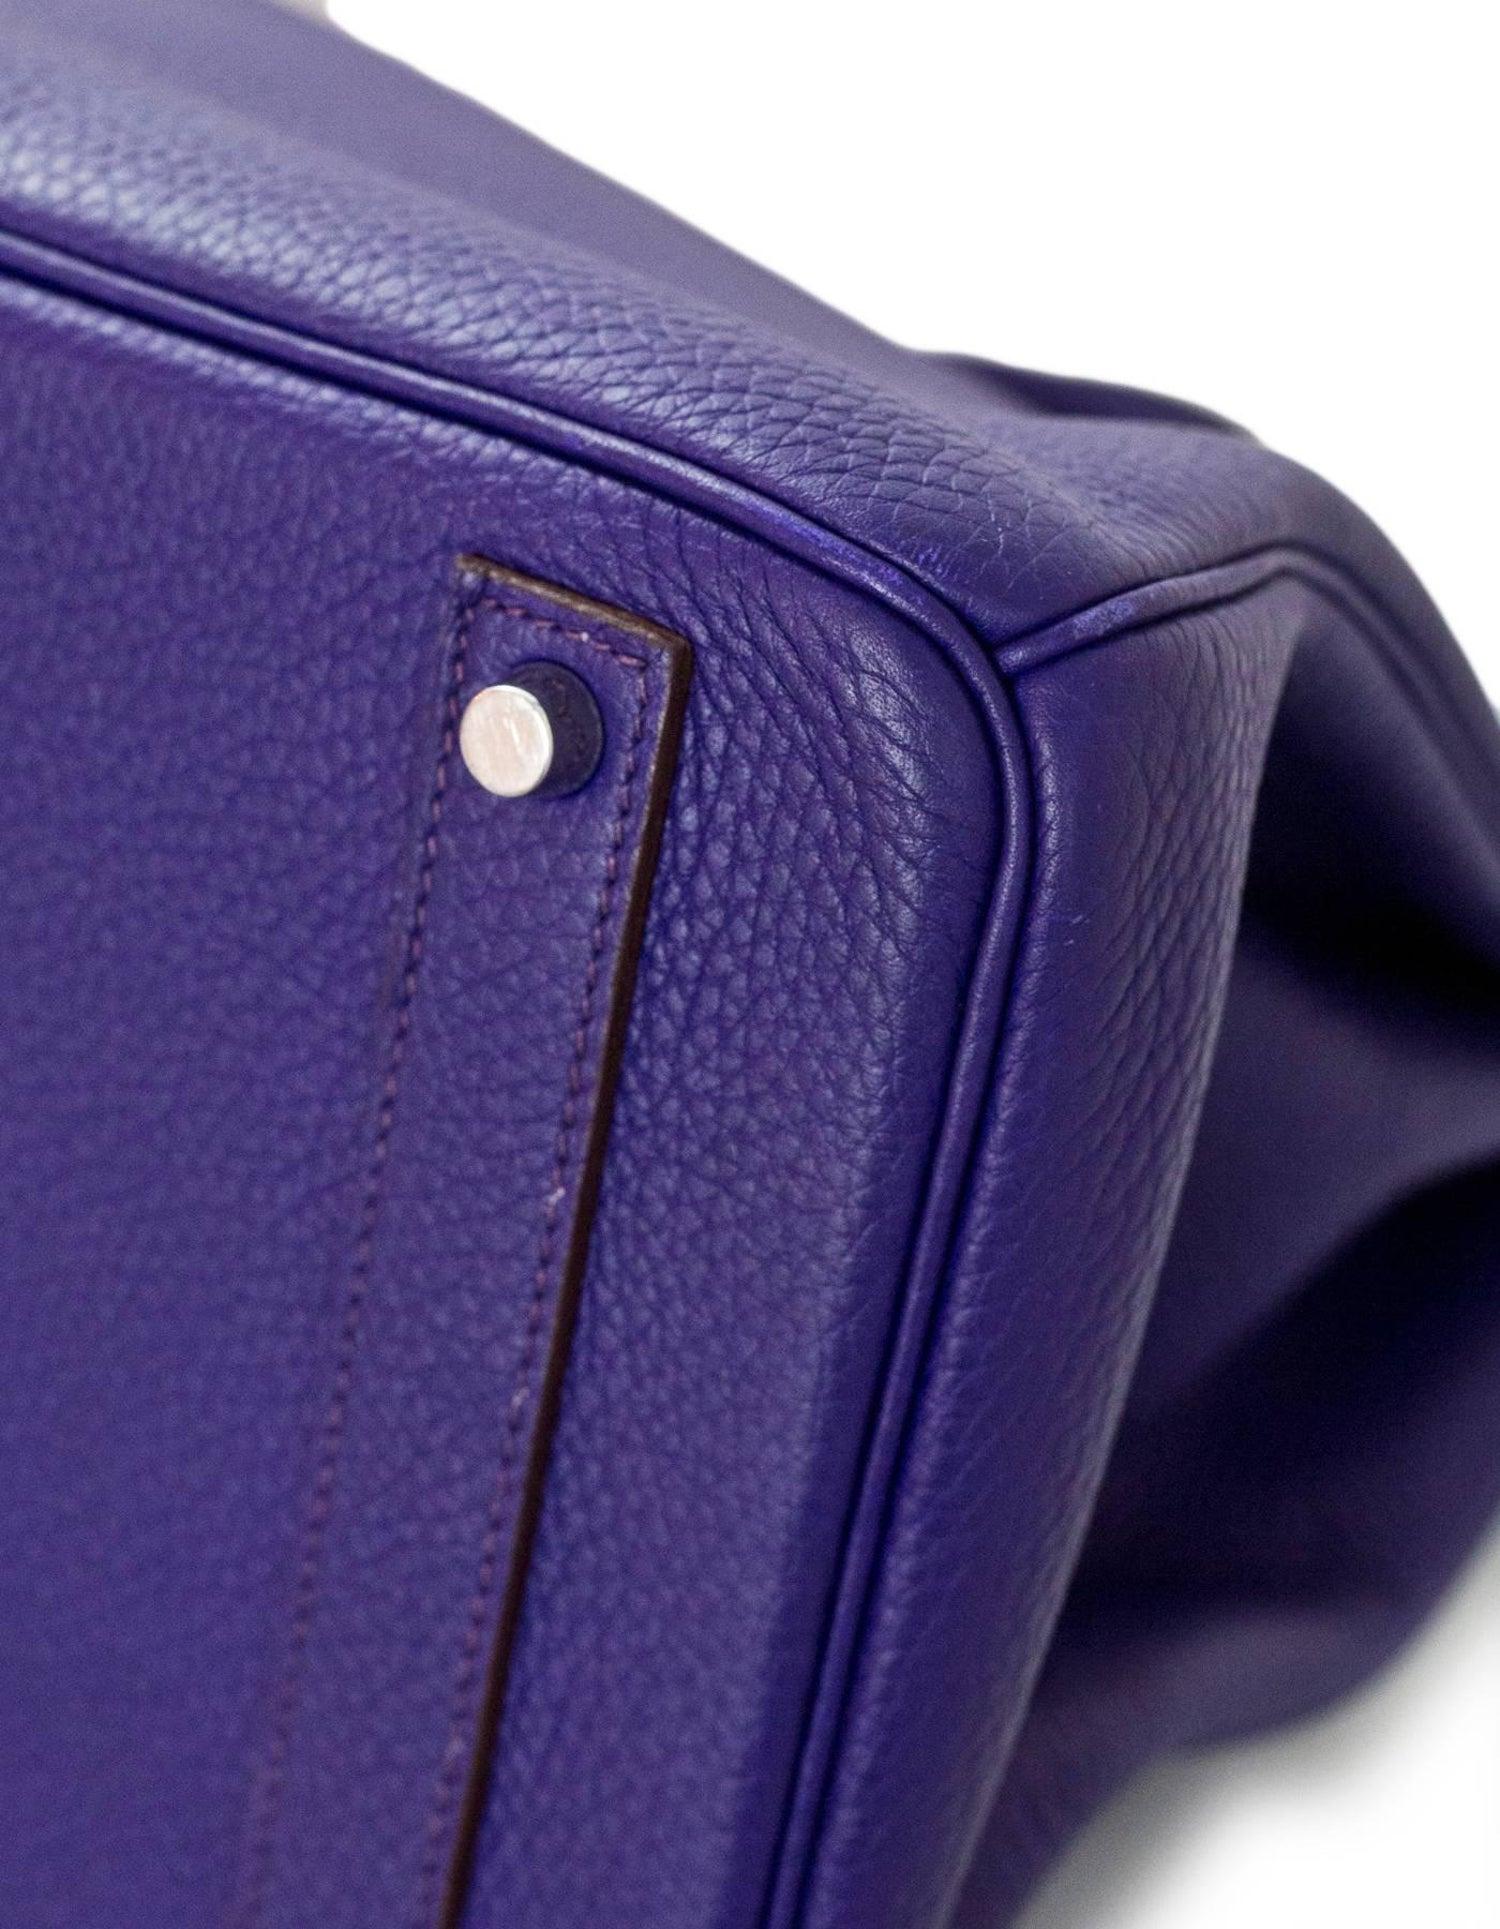 f6fbacf24f Hermes Iris Togo Leather 40cm Birkin Bag with Rain Coat For Sale at 1stdibs